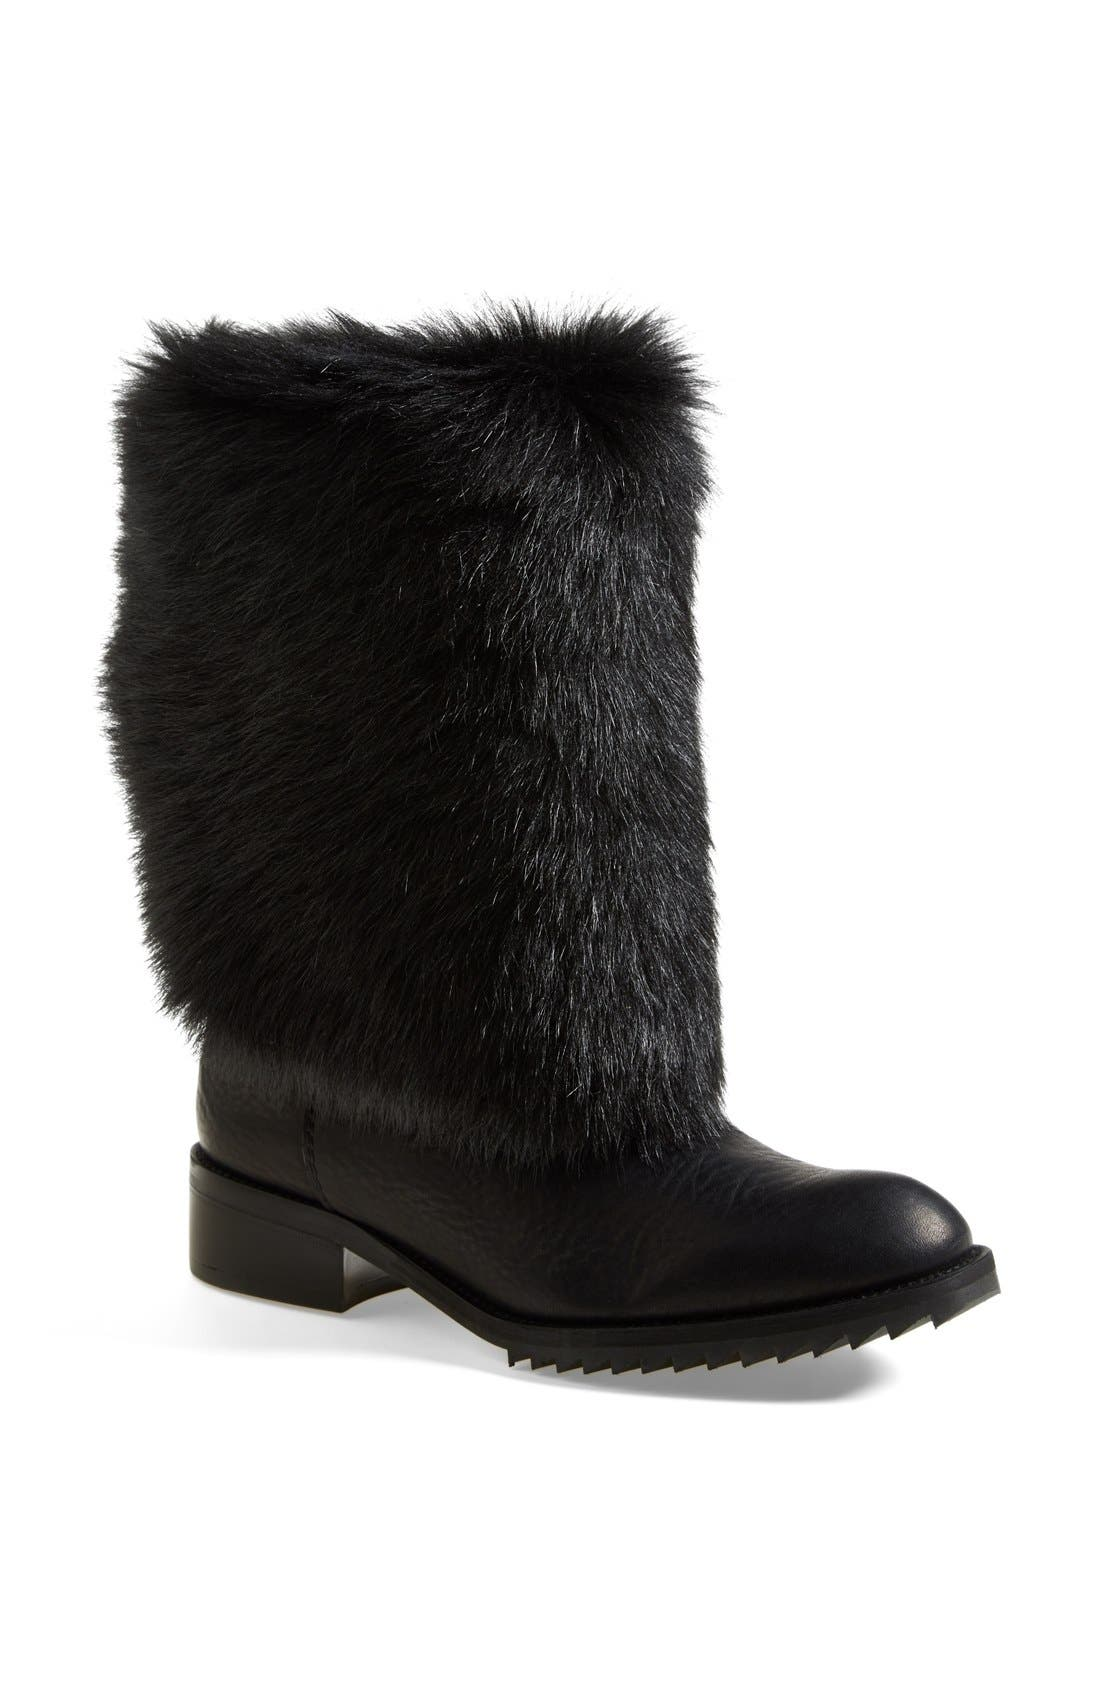 Main Image - Pedro Garcia 'Odette' Genuine Shearling & Leather Boot (Women)